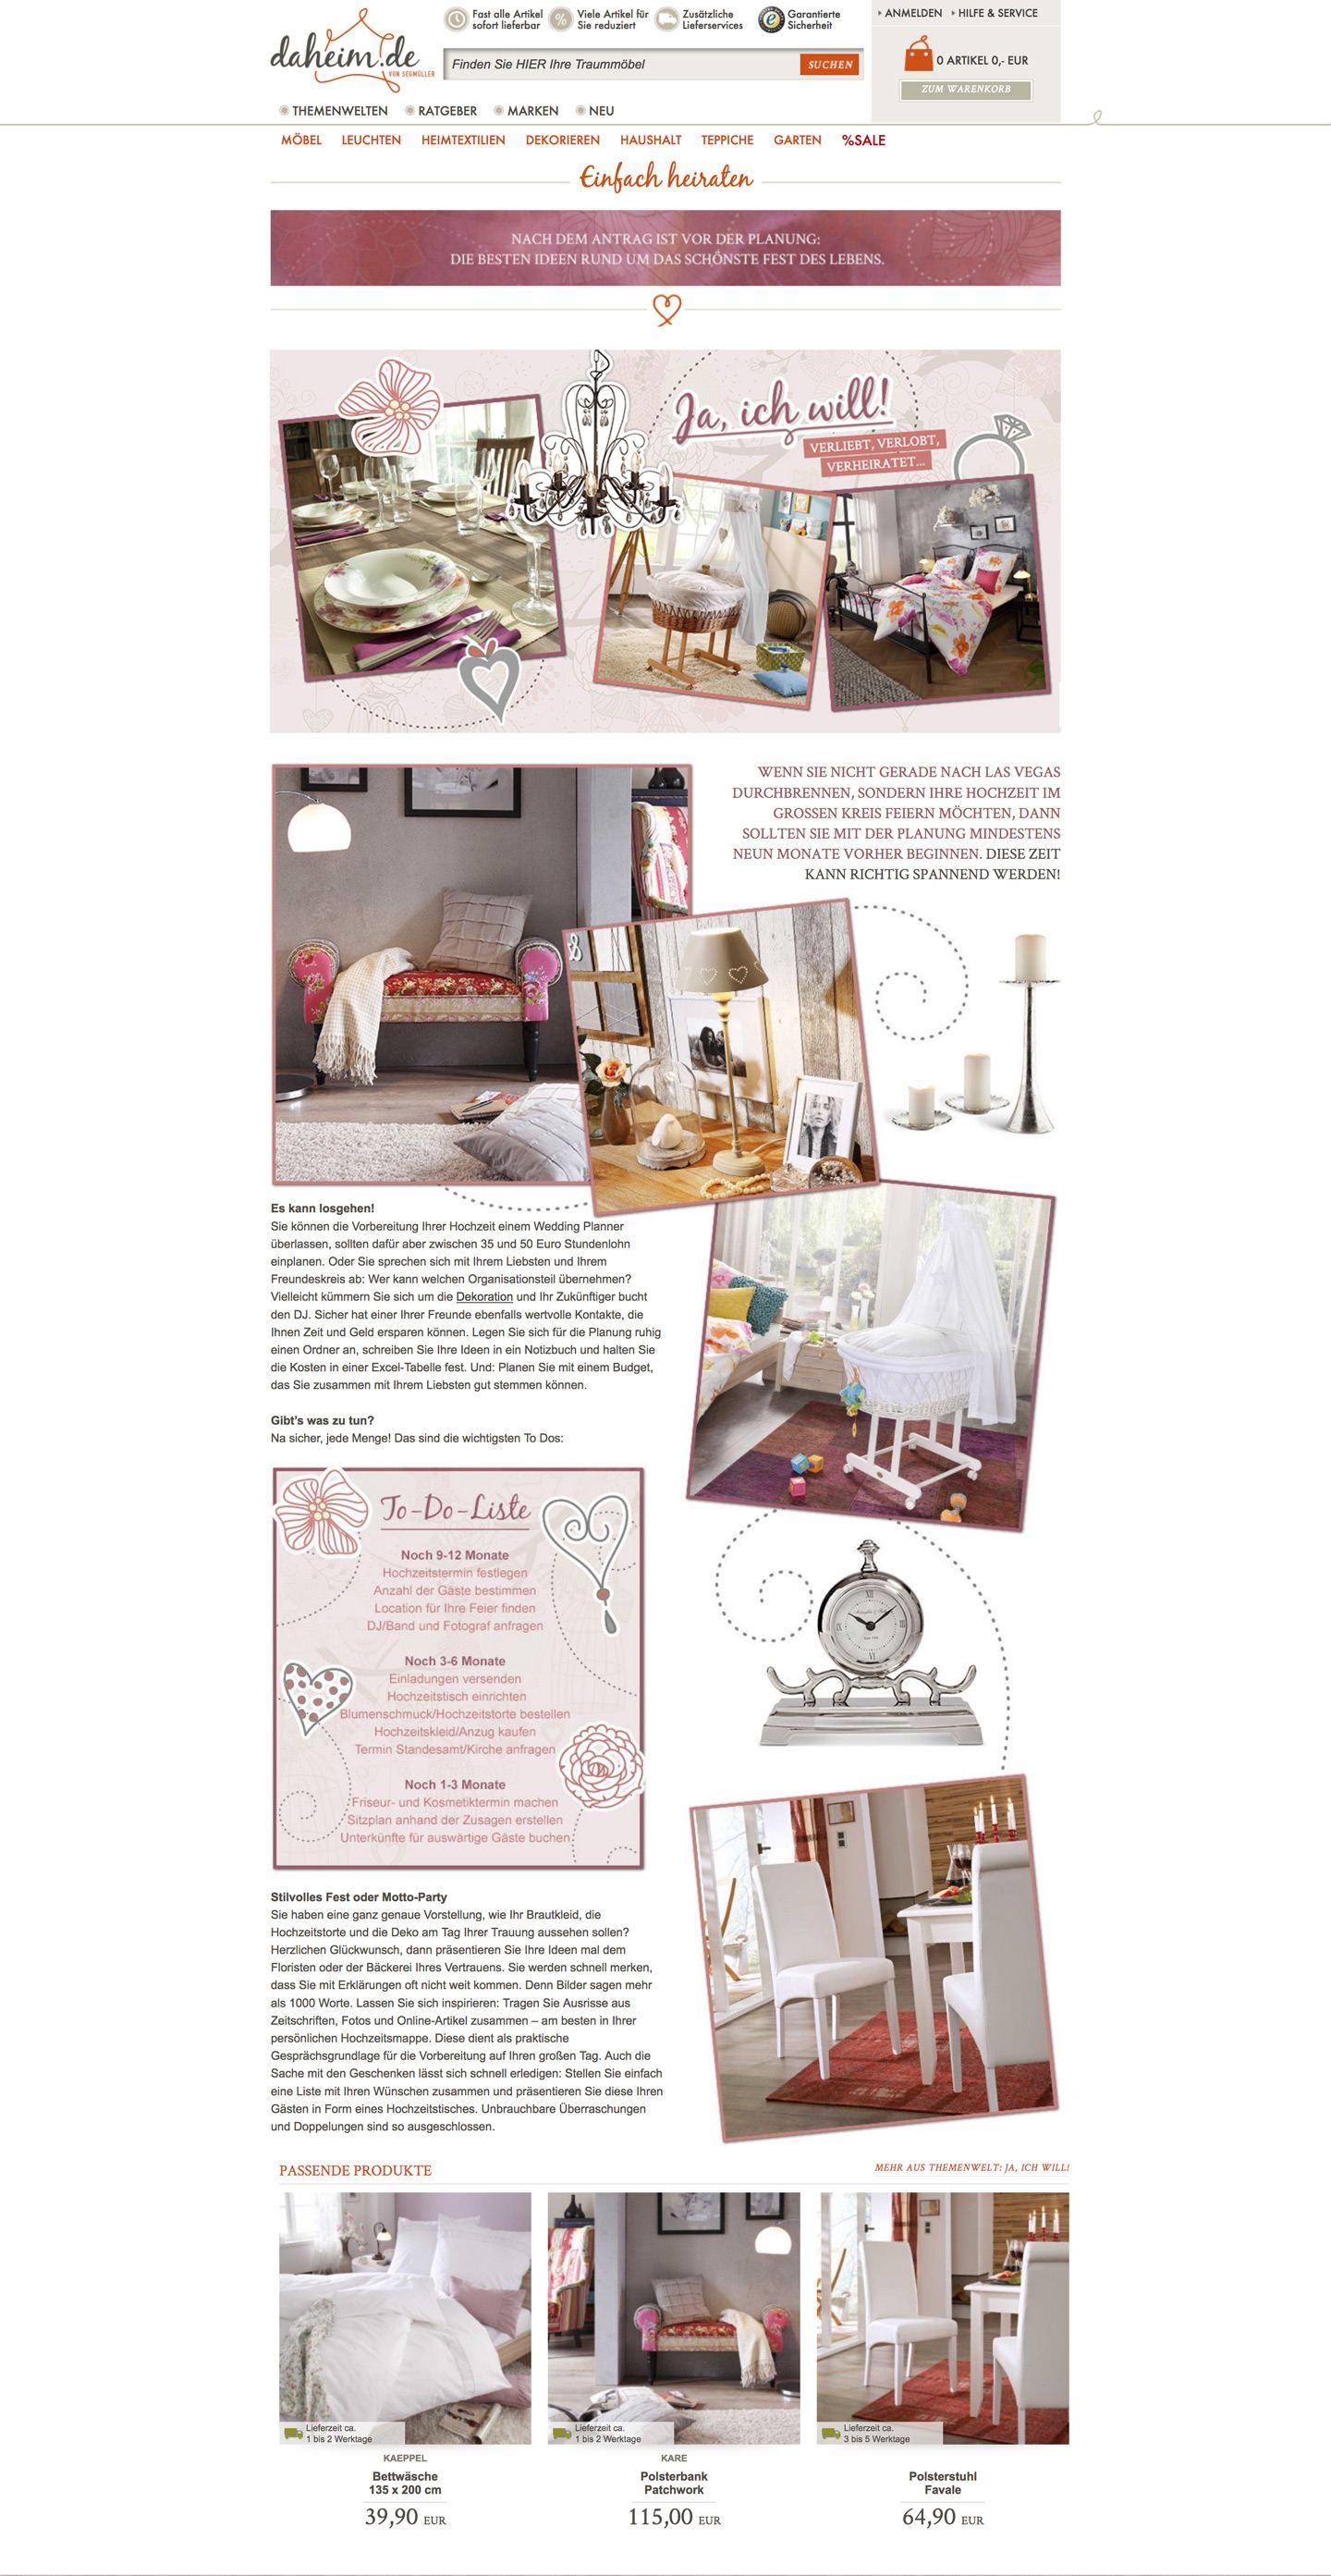 Daheim.de Website Stefie Plendl